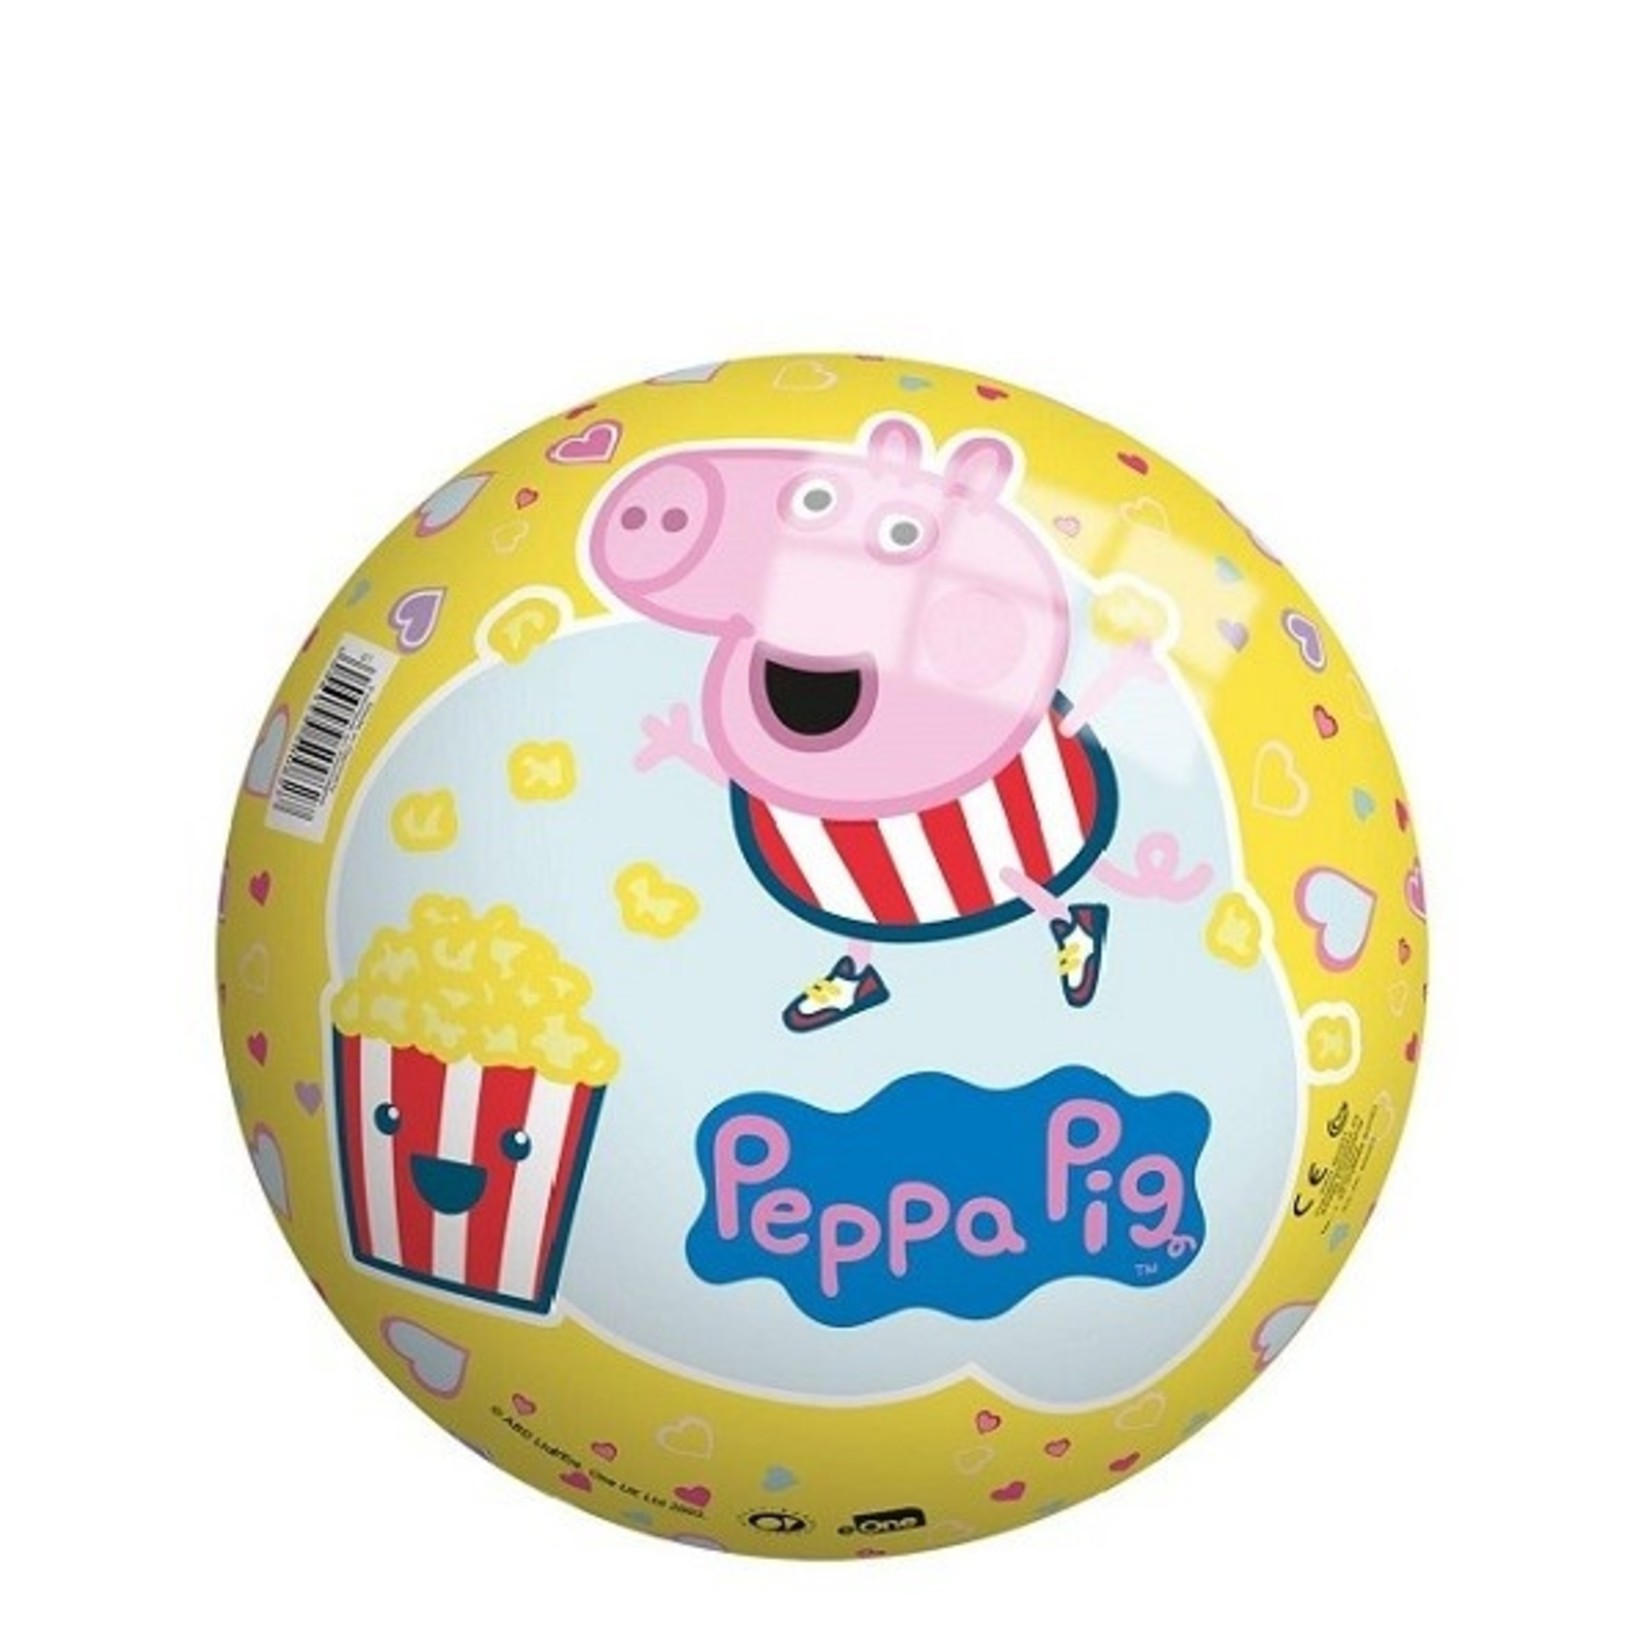 Peppa Pig Bal 23 cm